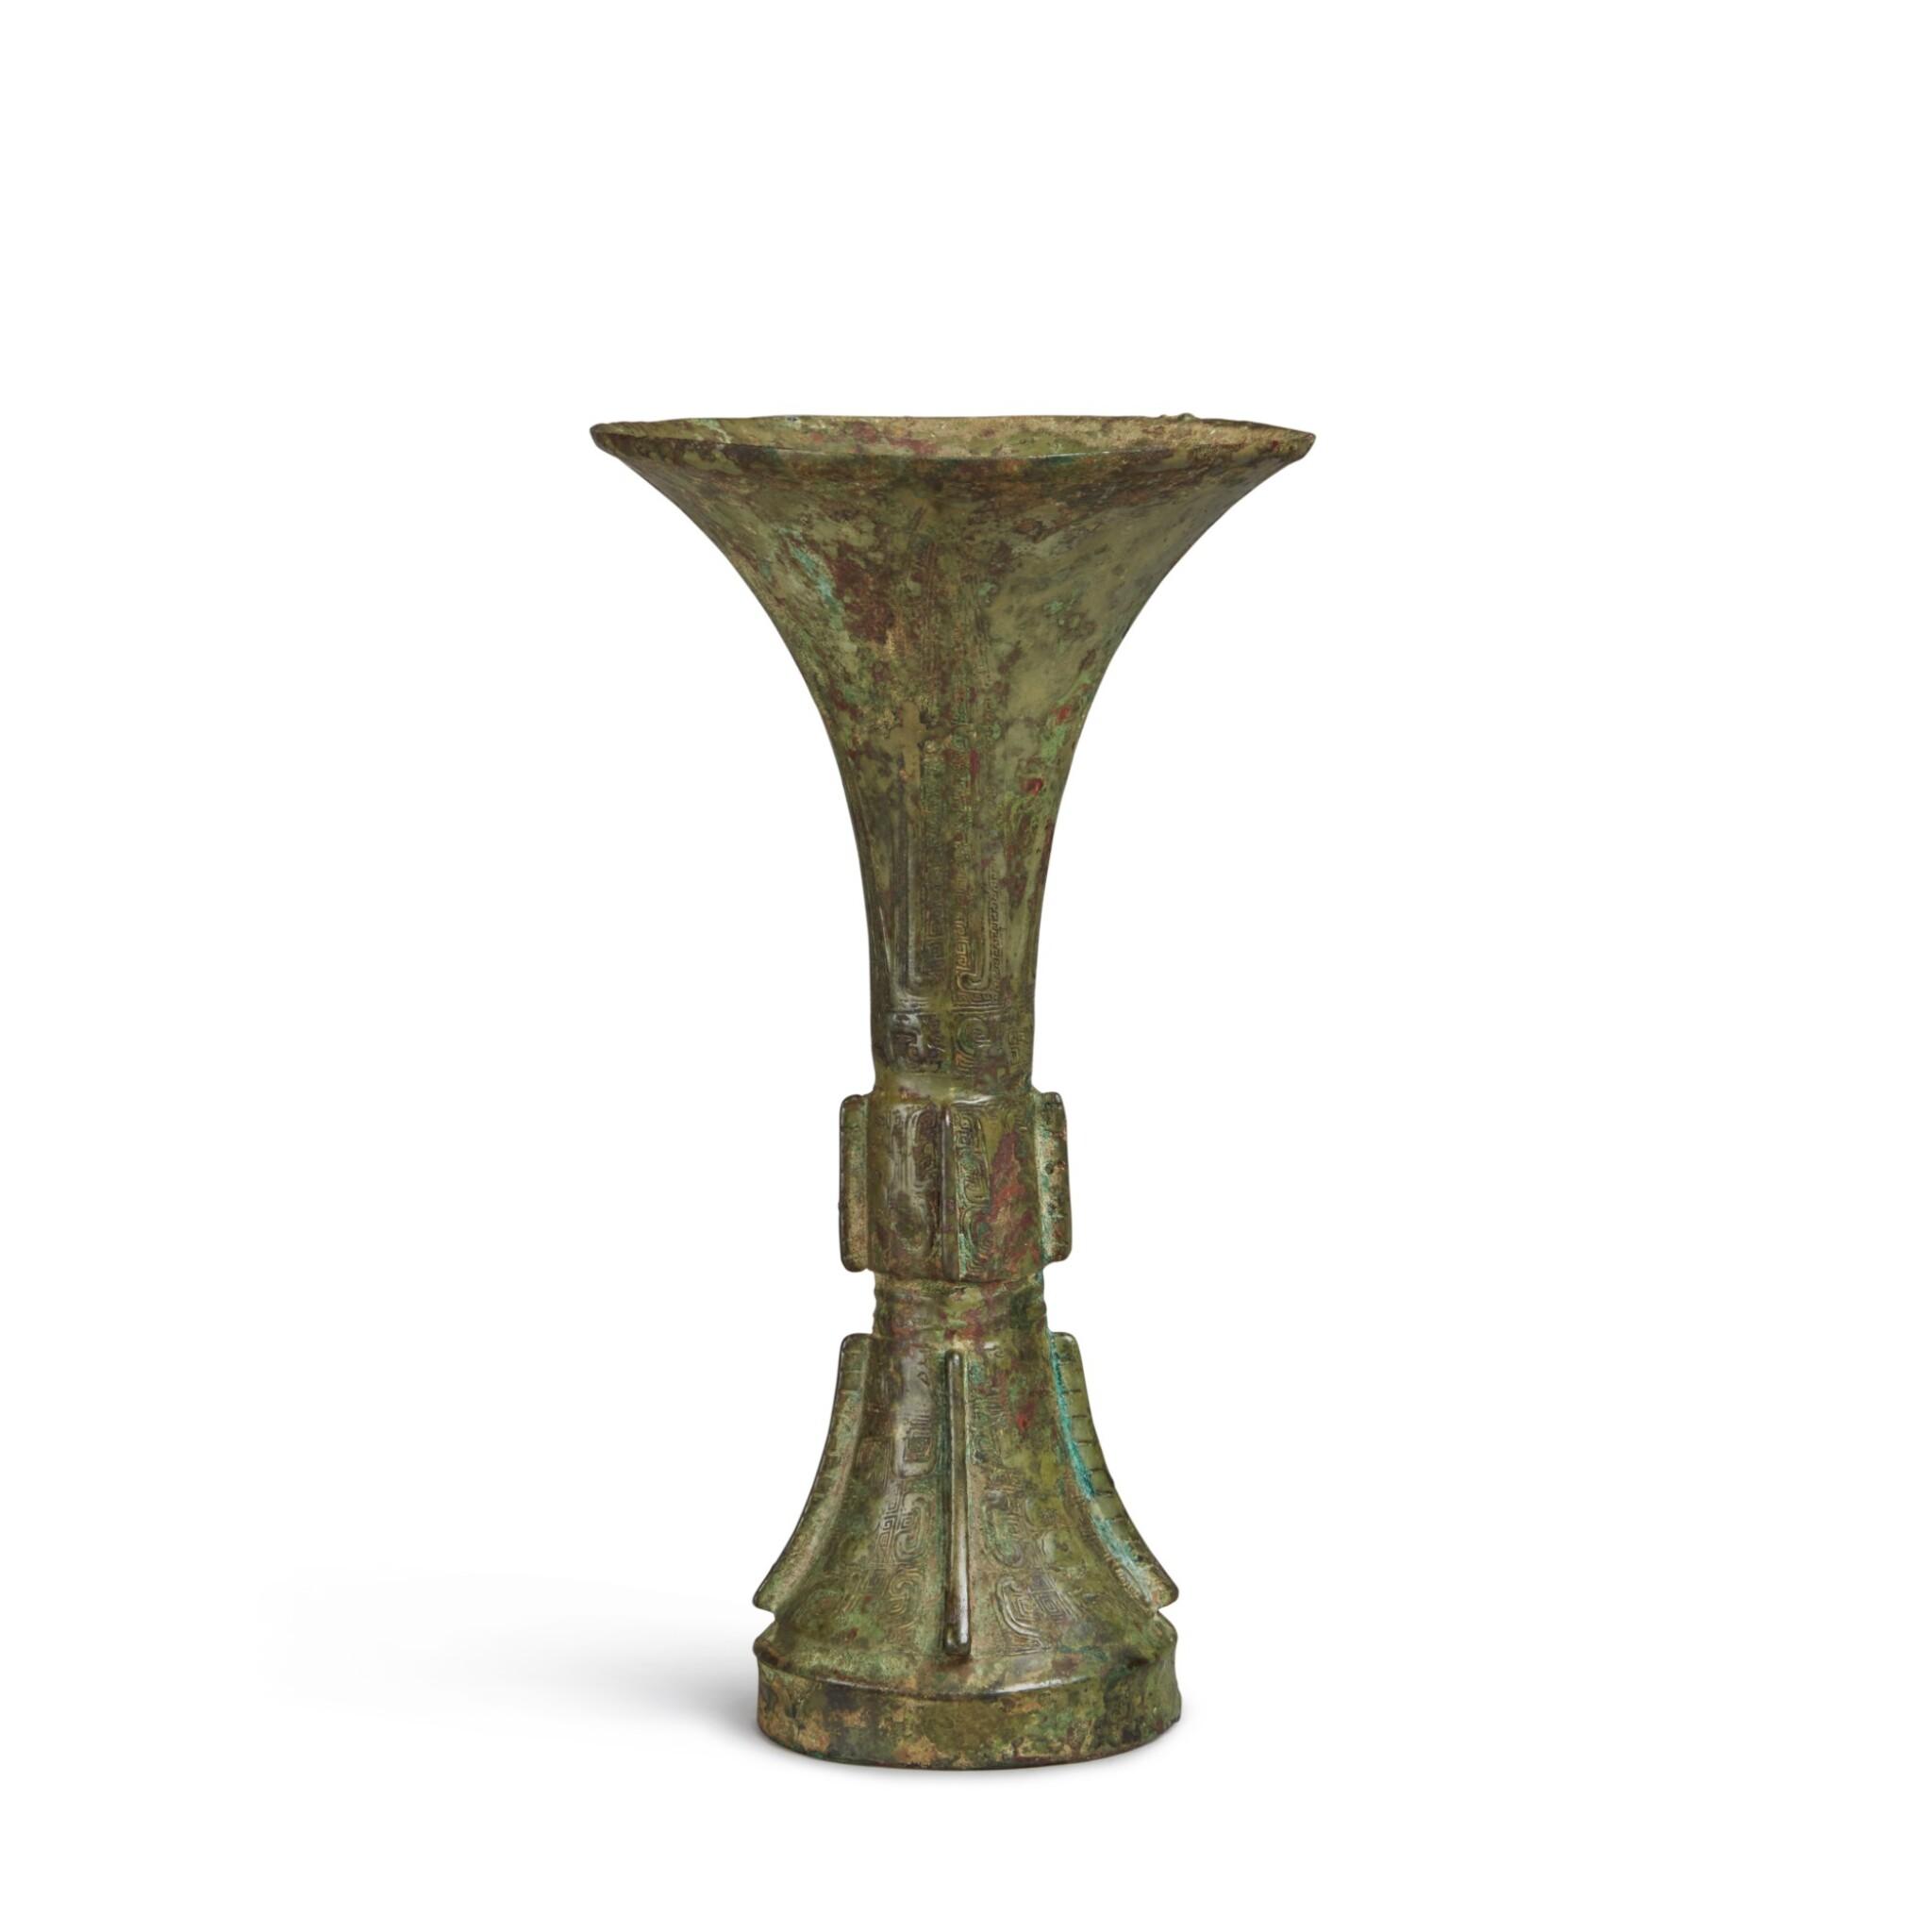 View full screen - View 1 of Lot 2. An archaic bronze ritual wine vessel (Gu), Late Shang dynasty | 商末 青銅饕餮紋觚.